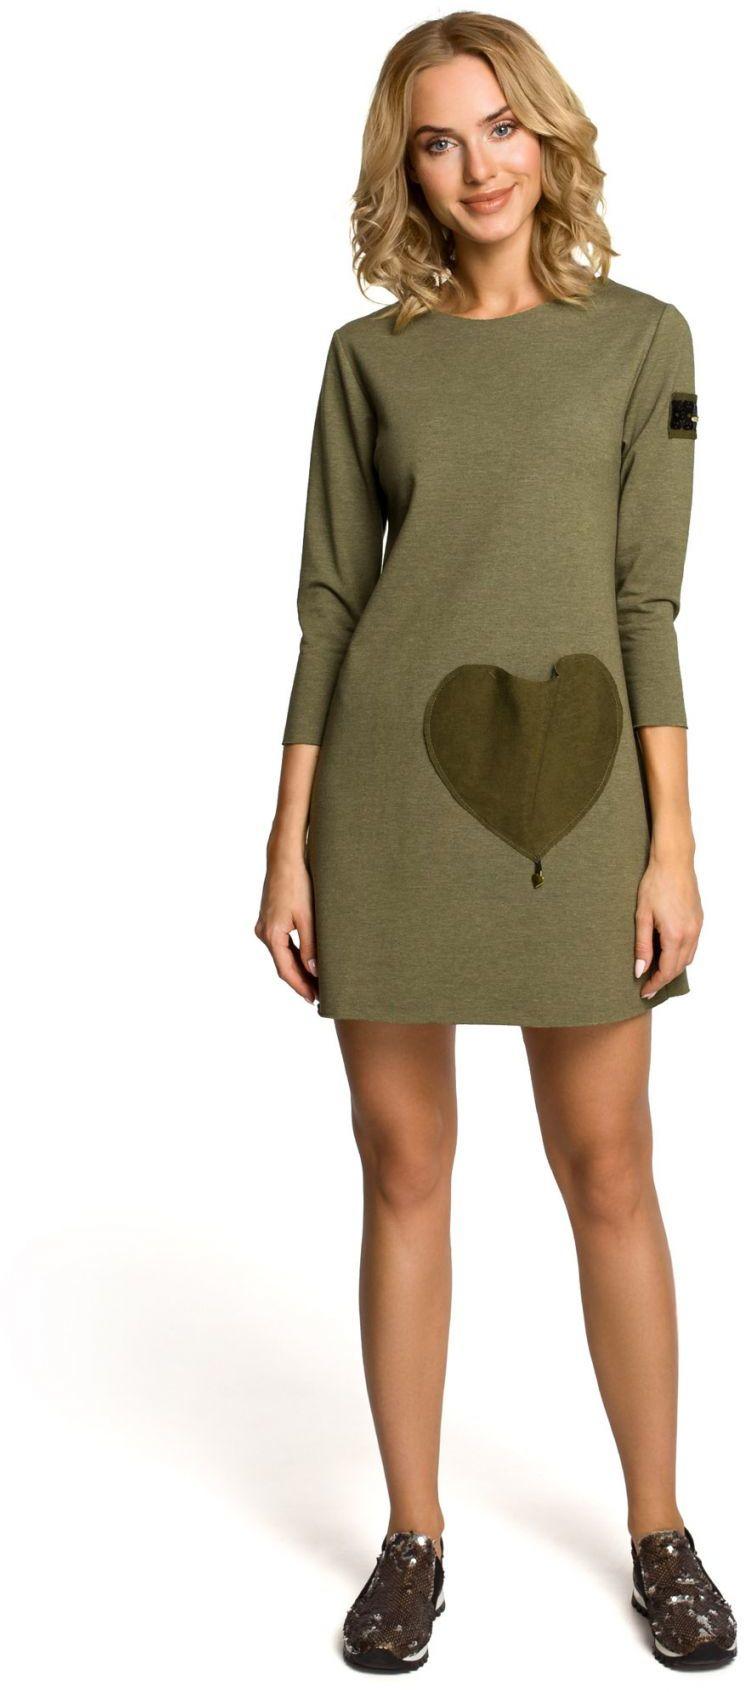 M053 Mini sukienka - tunika z dzianiny - khaki